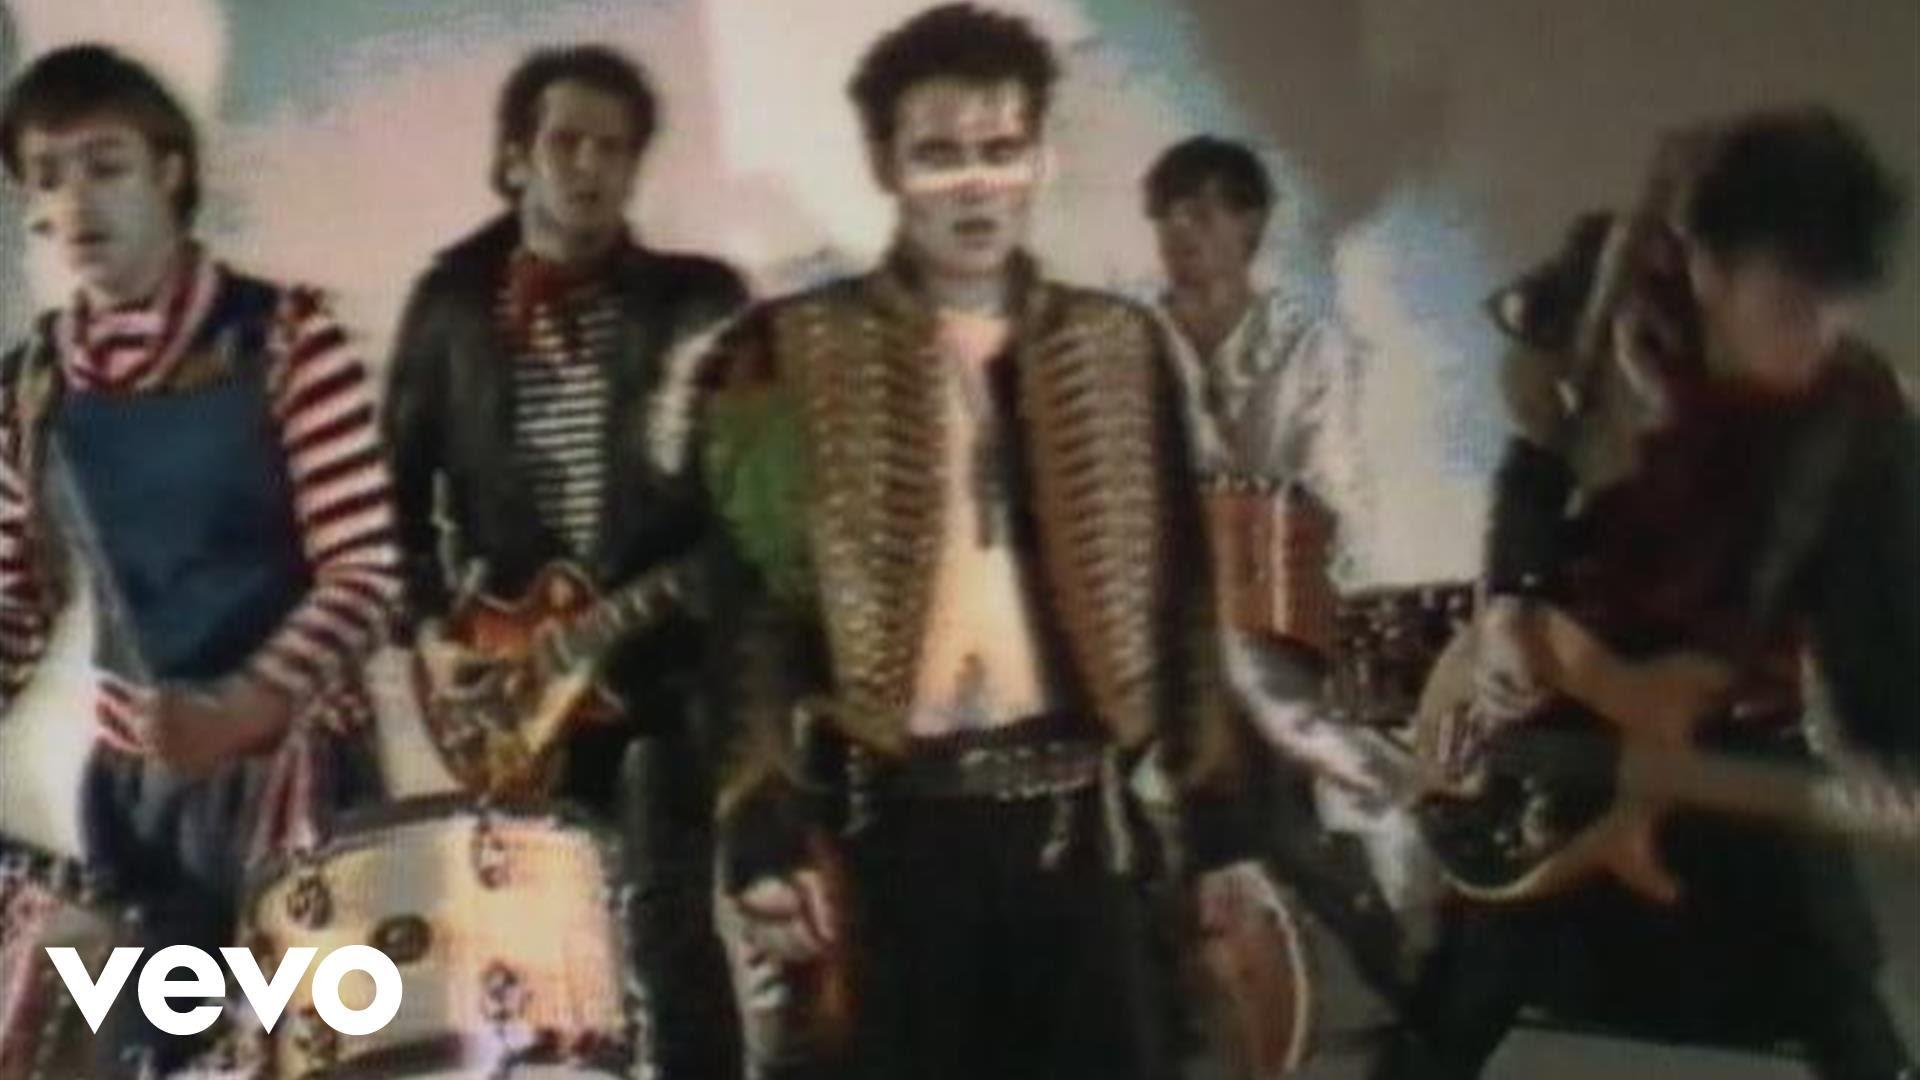 Adam & The Ants – Kings of the Wild Frontier